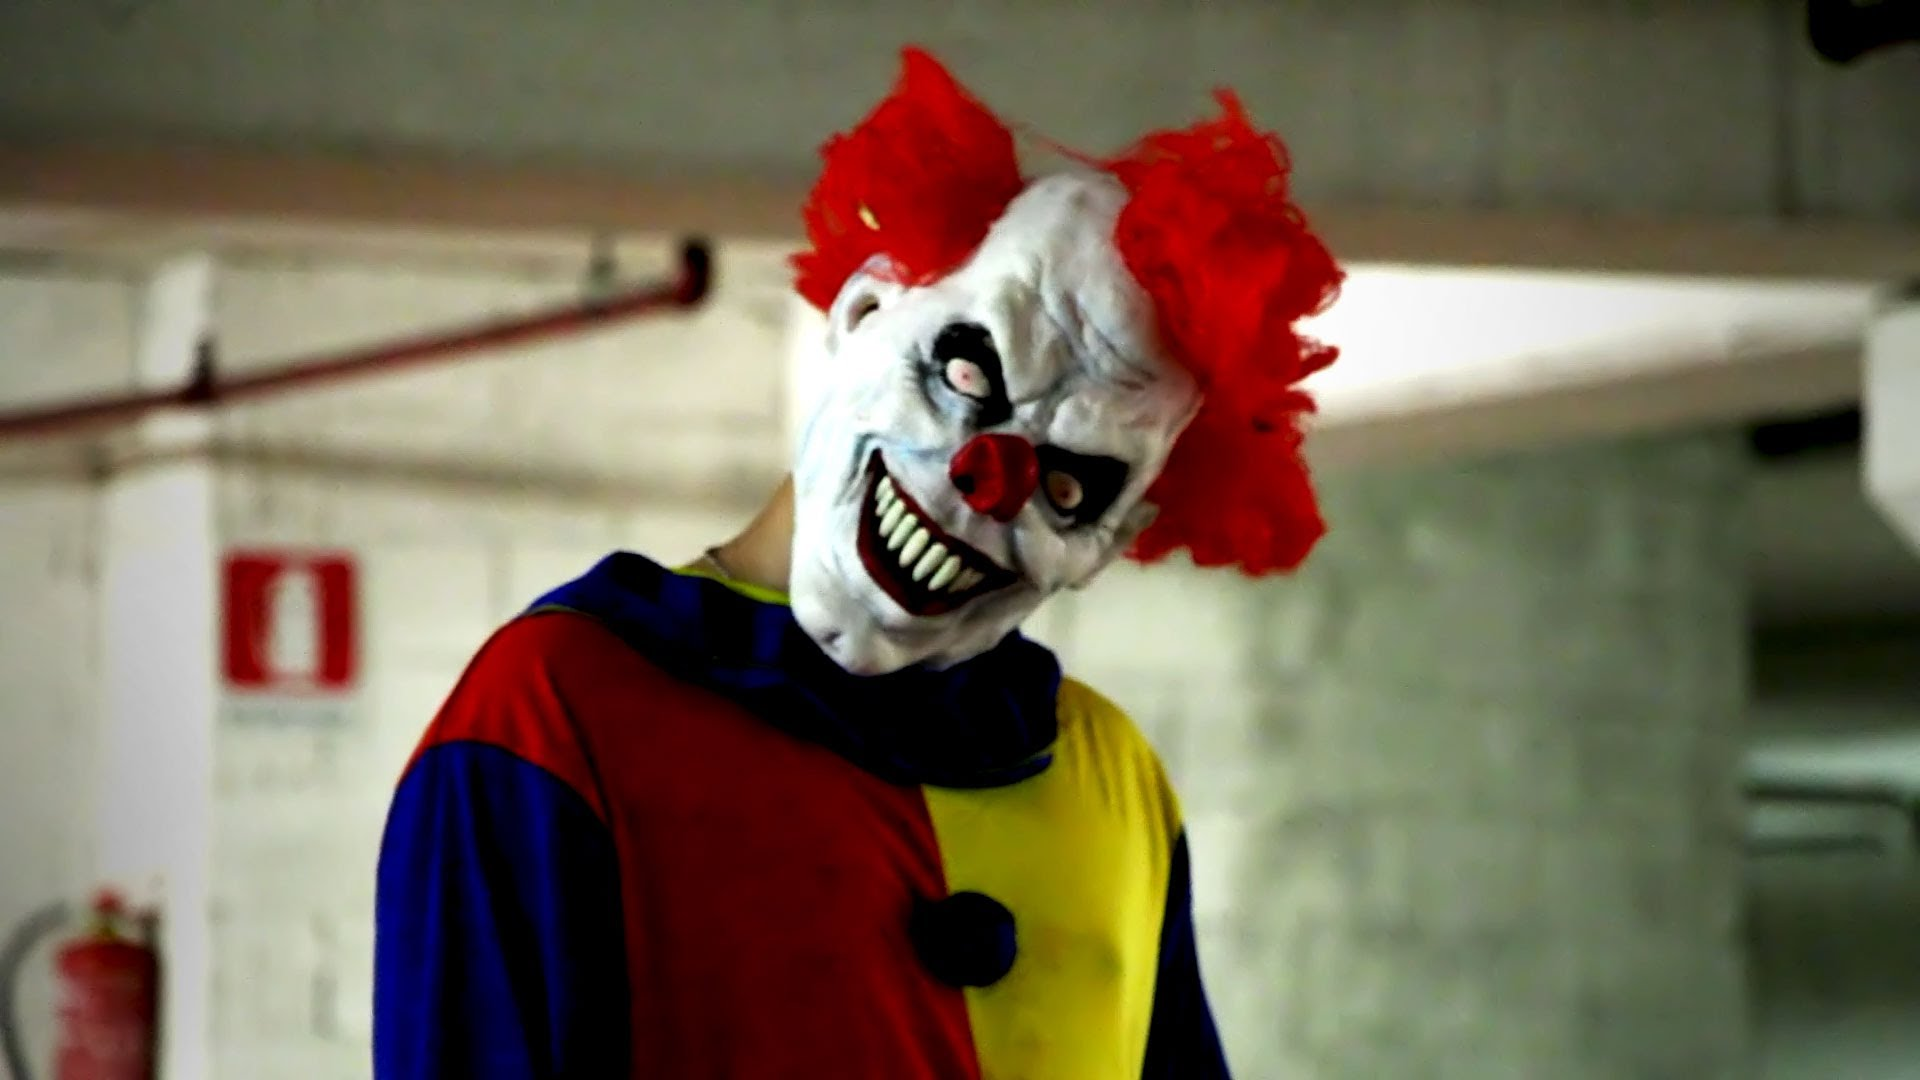 Killer CLown 1